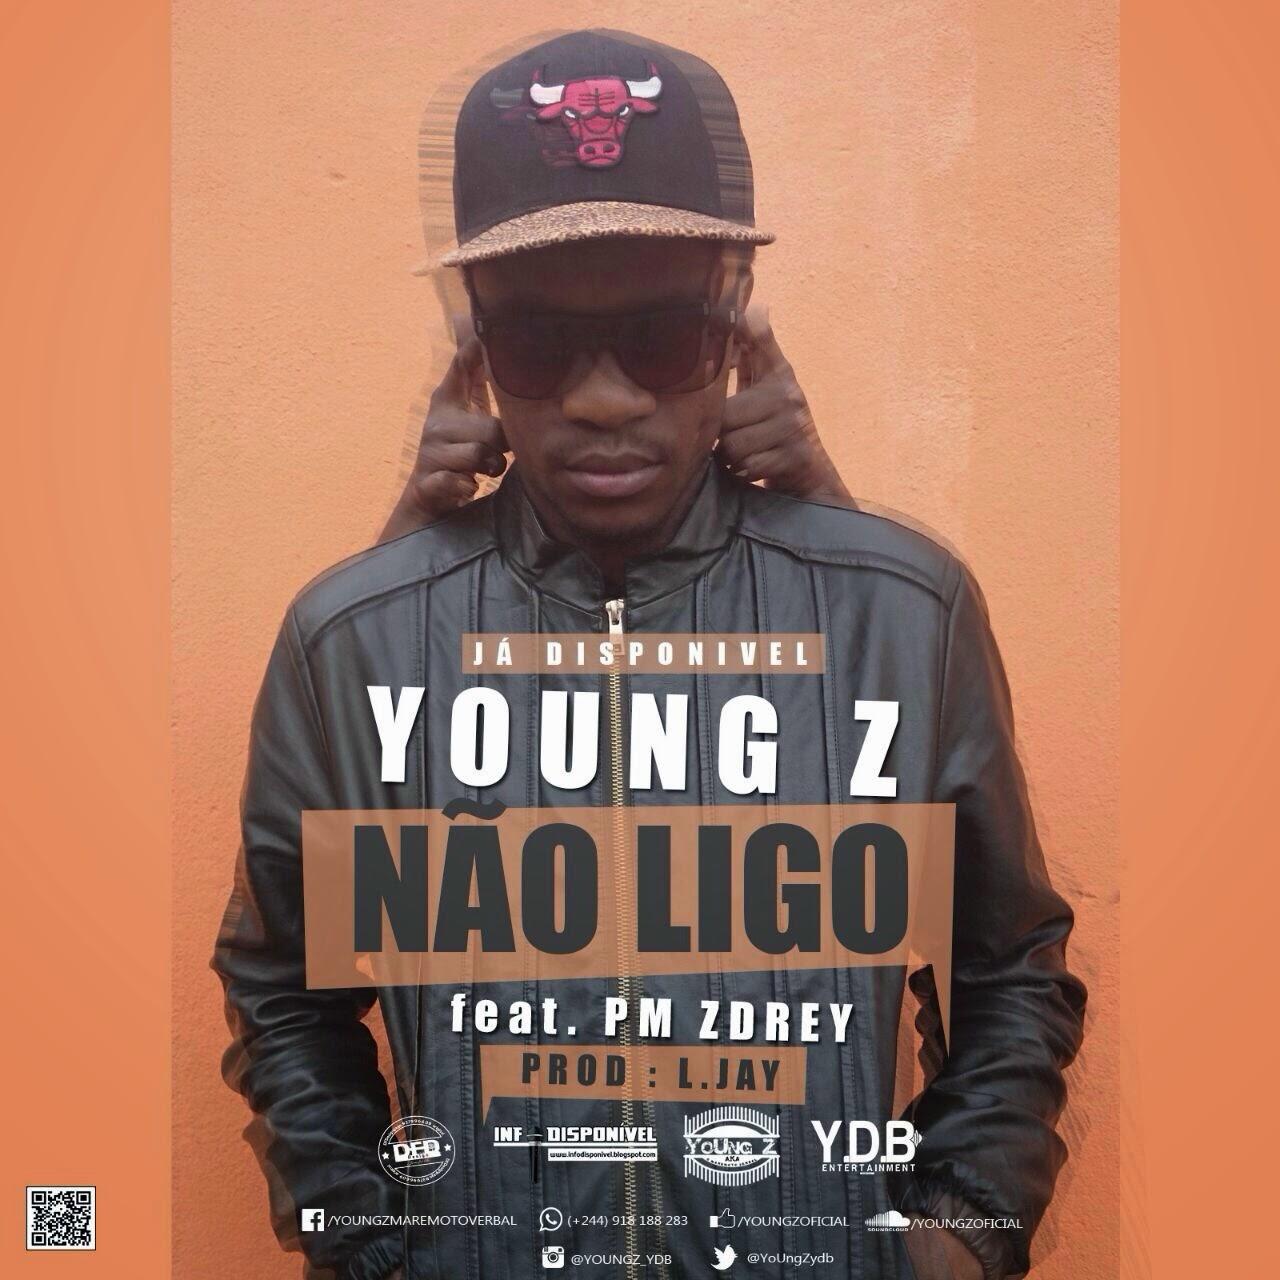 YoUng_Z - Não Ligo (Feat. PM Zdrey) [Prod. L Jay]